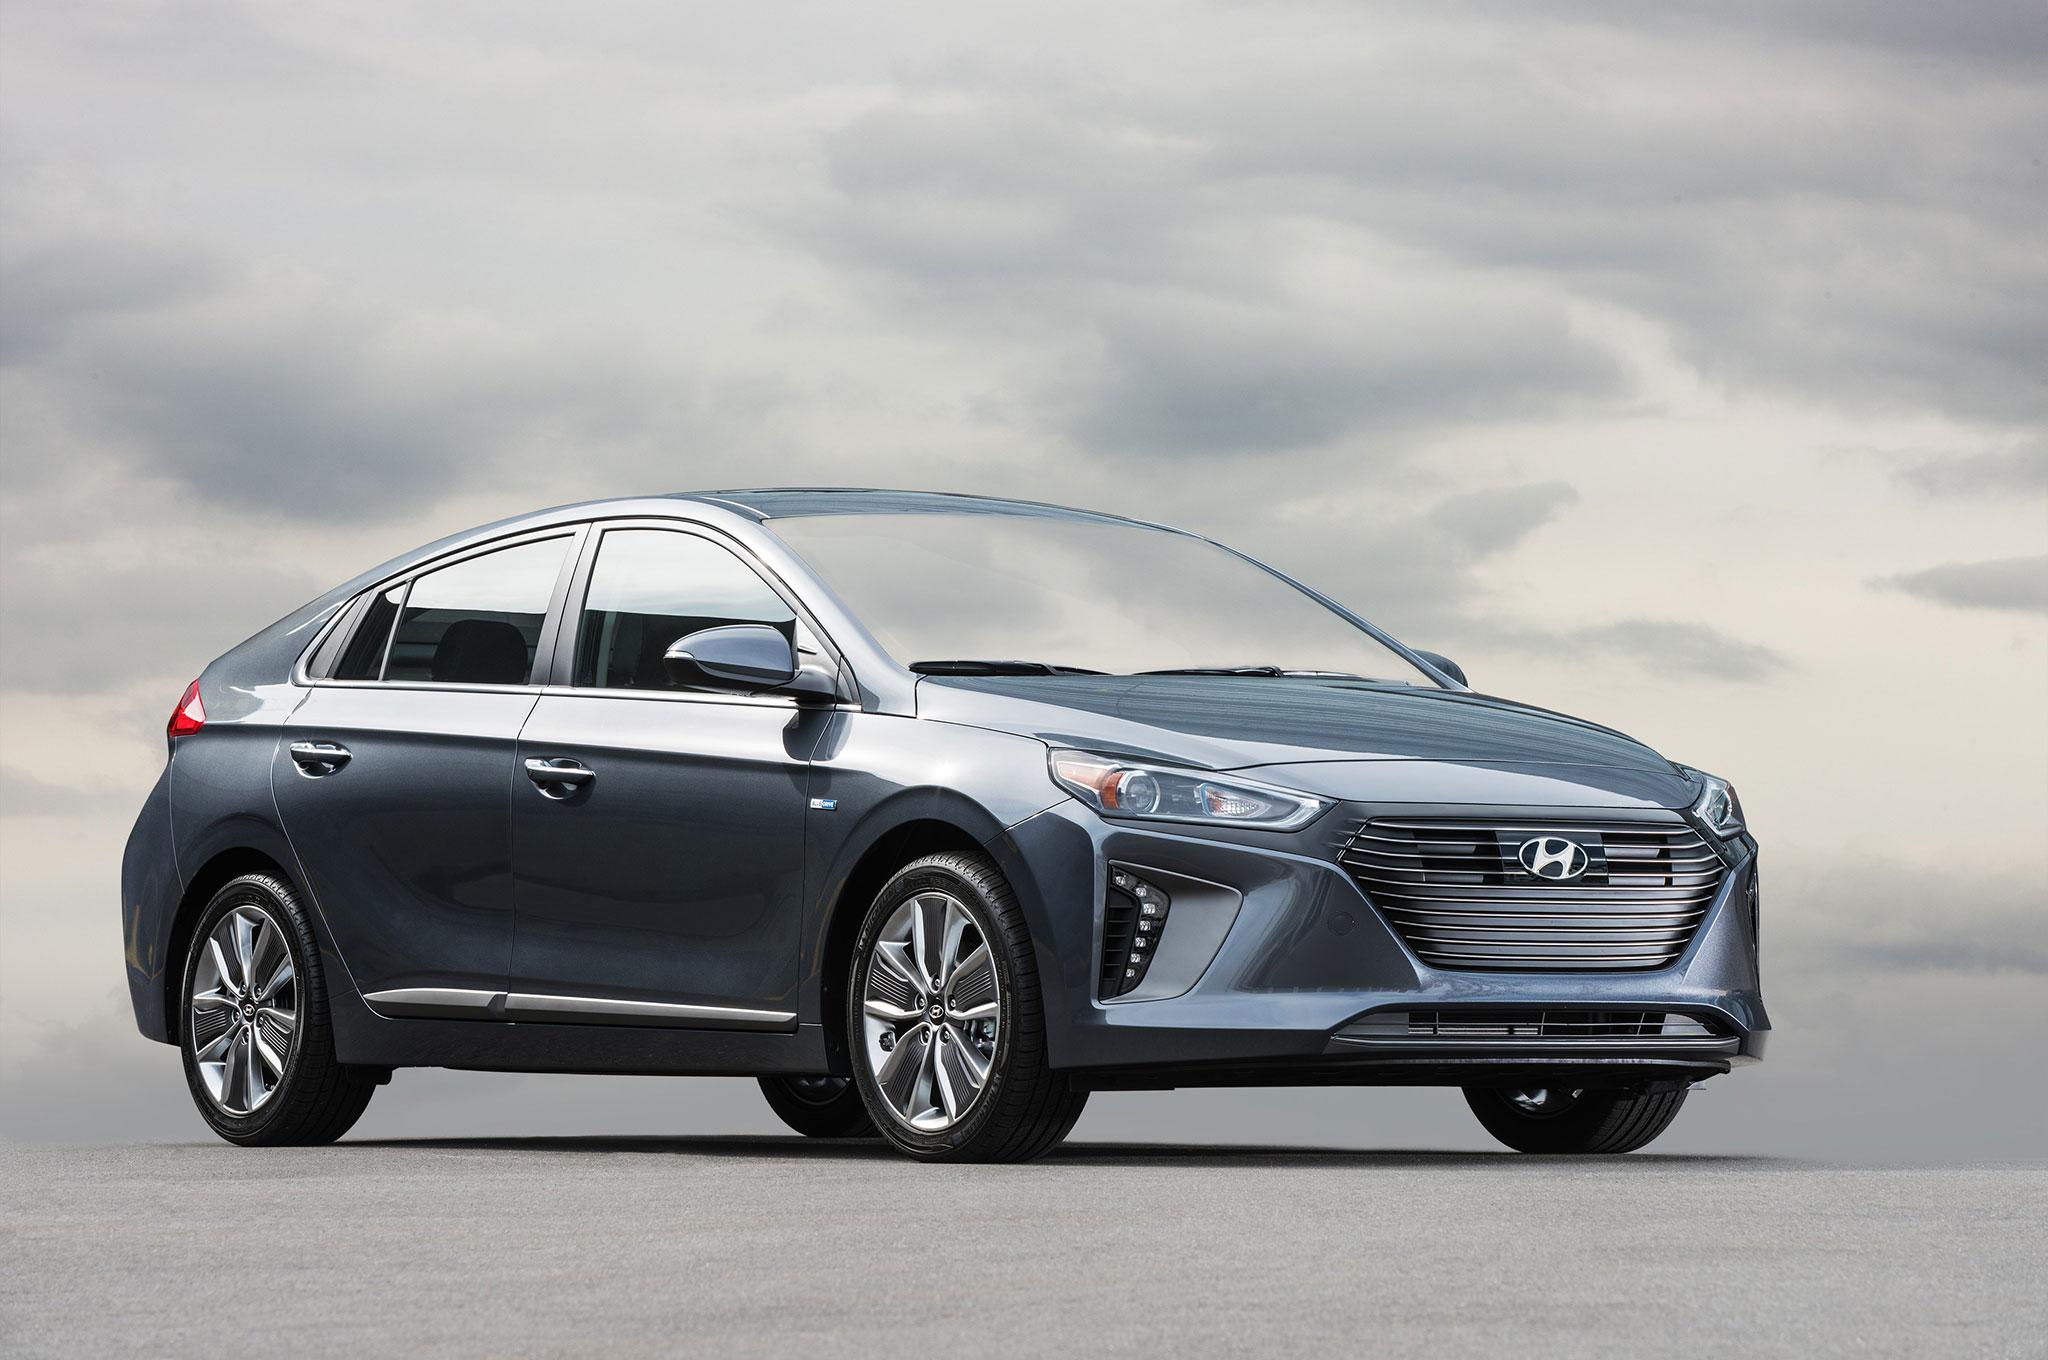 2017 Hyundai Ioniq Hybrid Plug In Electric Revealed 1984 Chevy Engine Diagram Show More